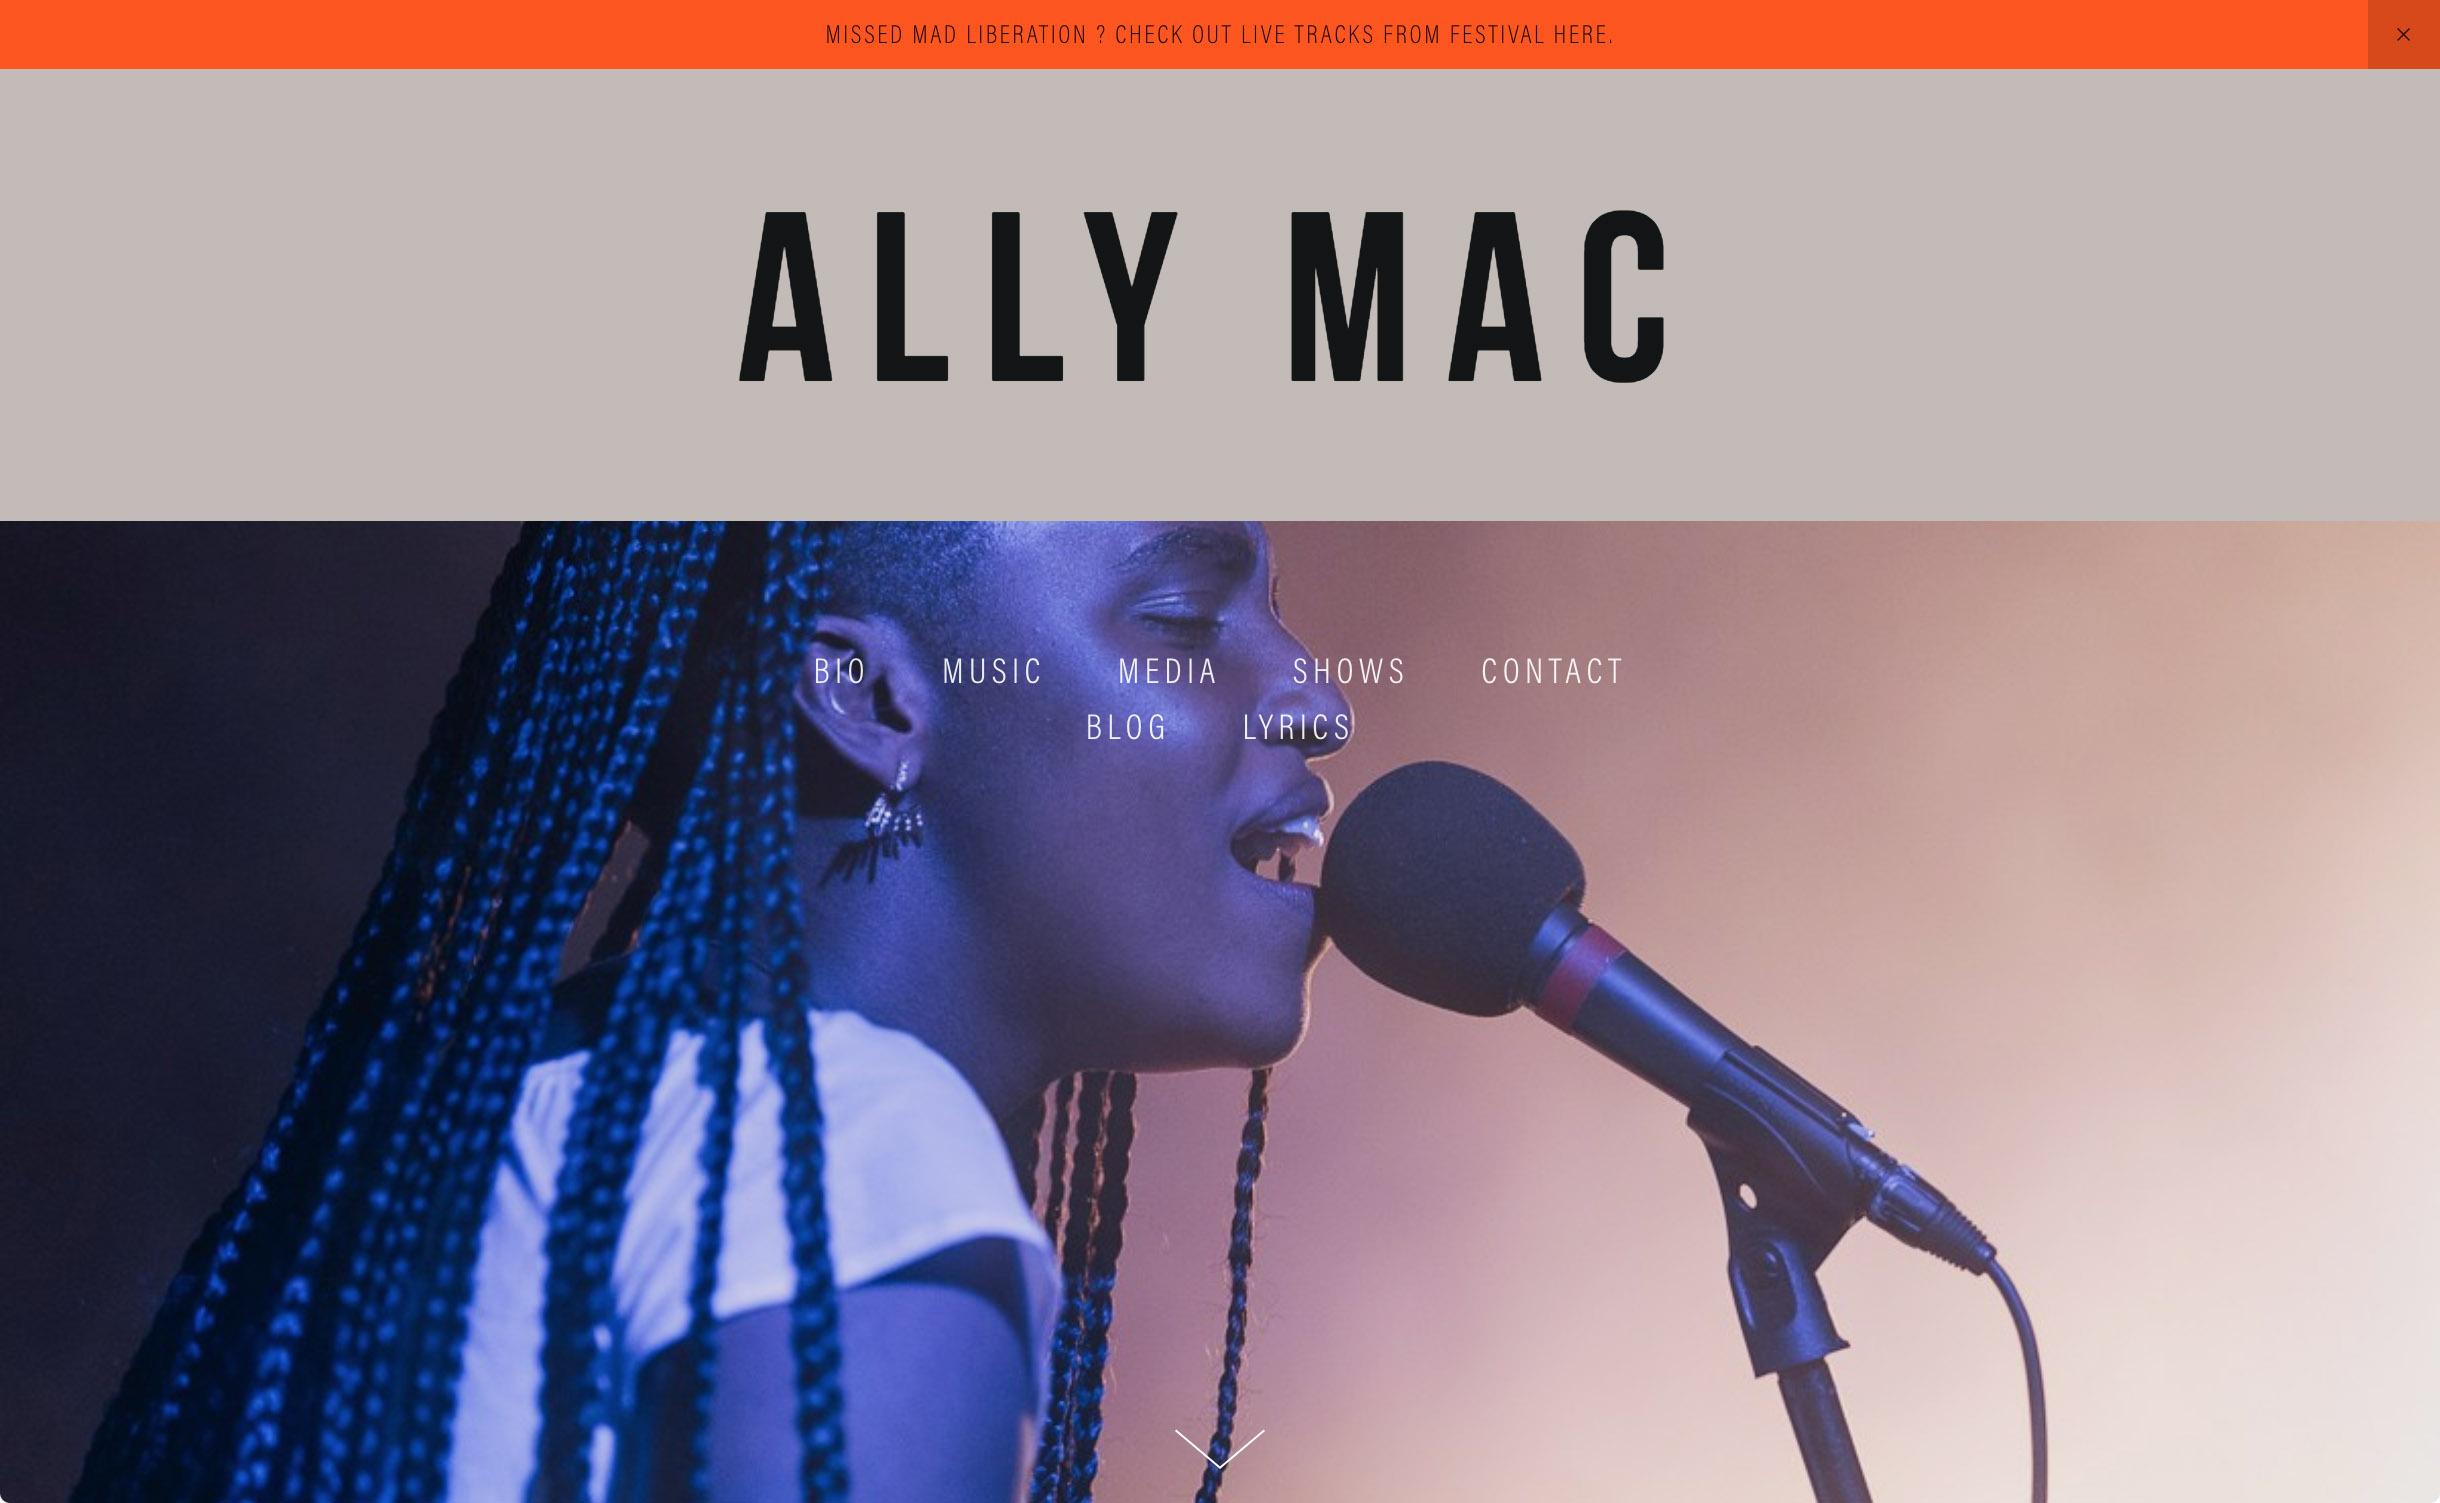 www.allymacmusic.com